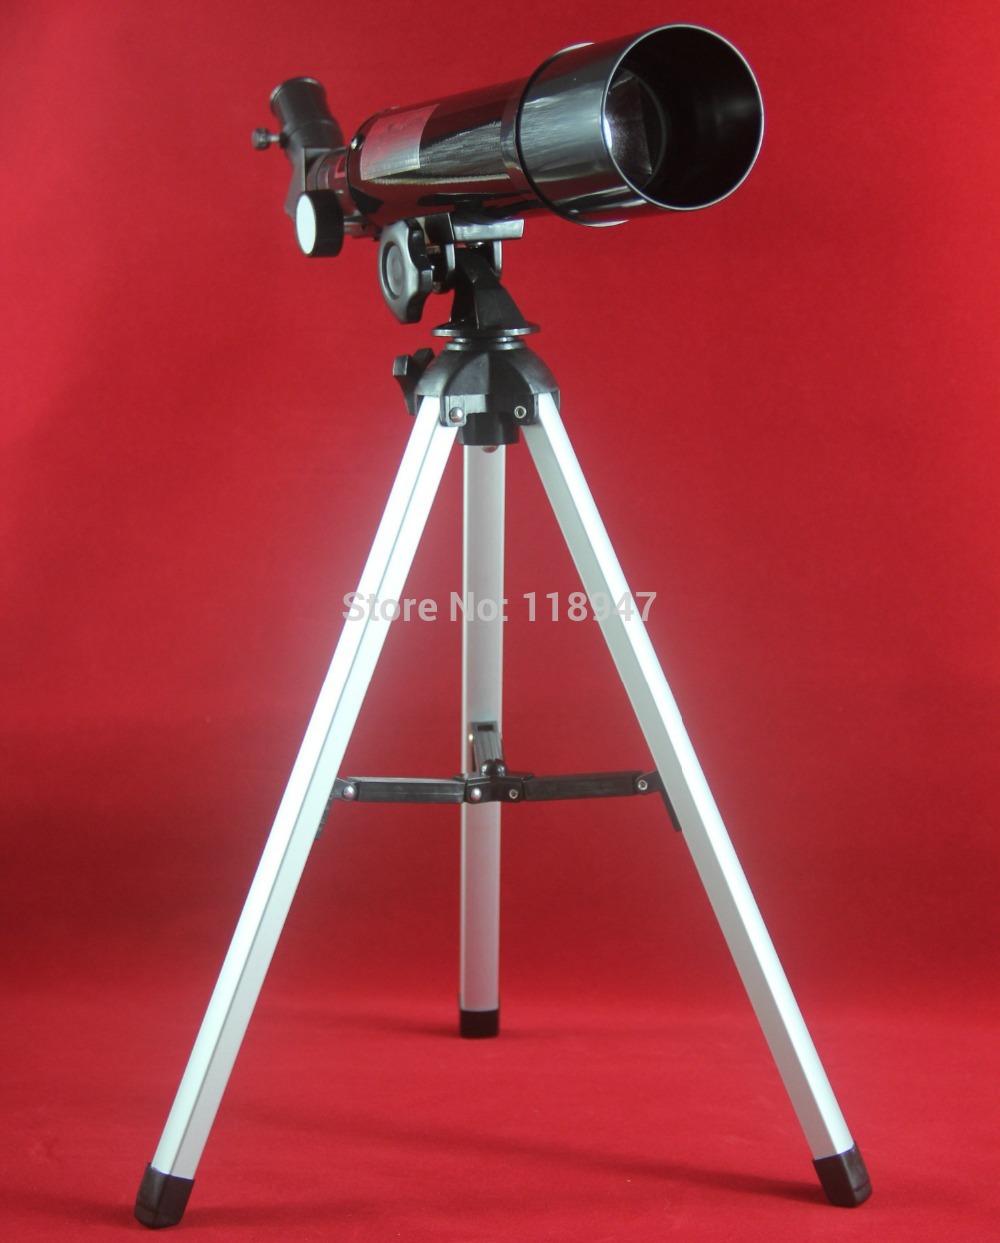 Brand New 180x Monocular Refractor Space Astronomical Telescope Spotting Scope(Erect image optics)(China (Mainland))